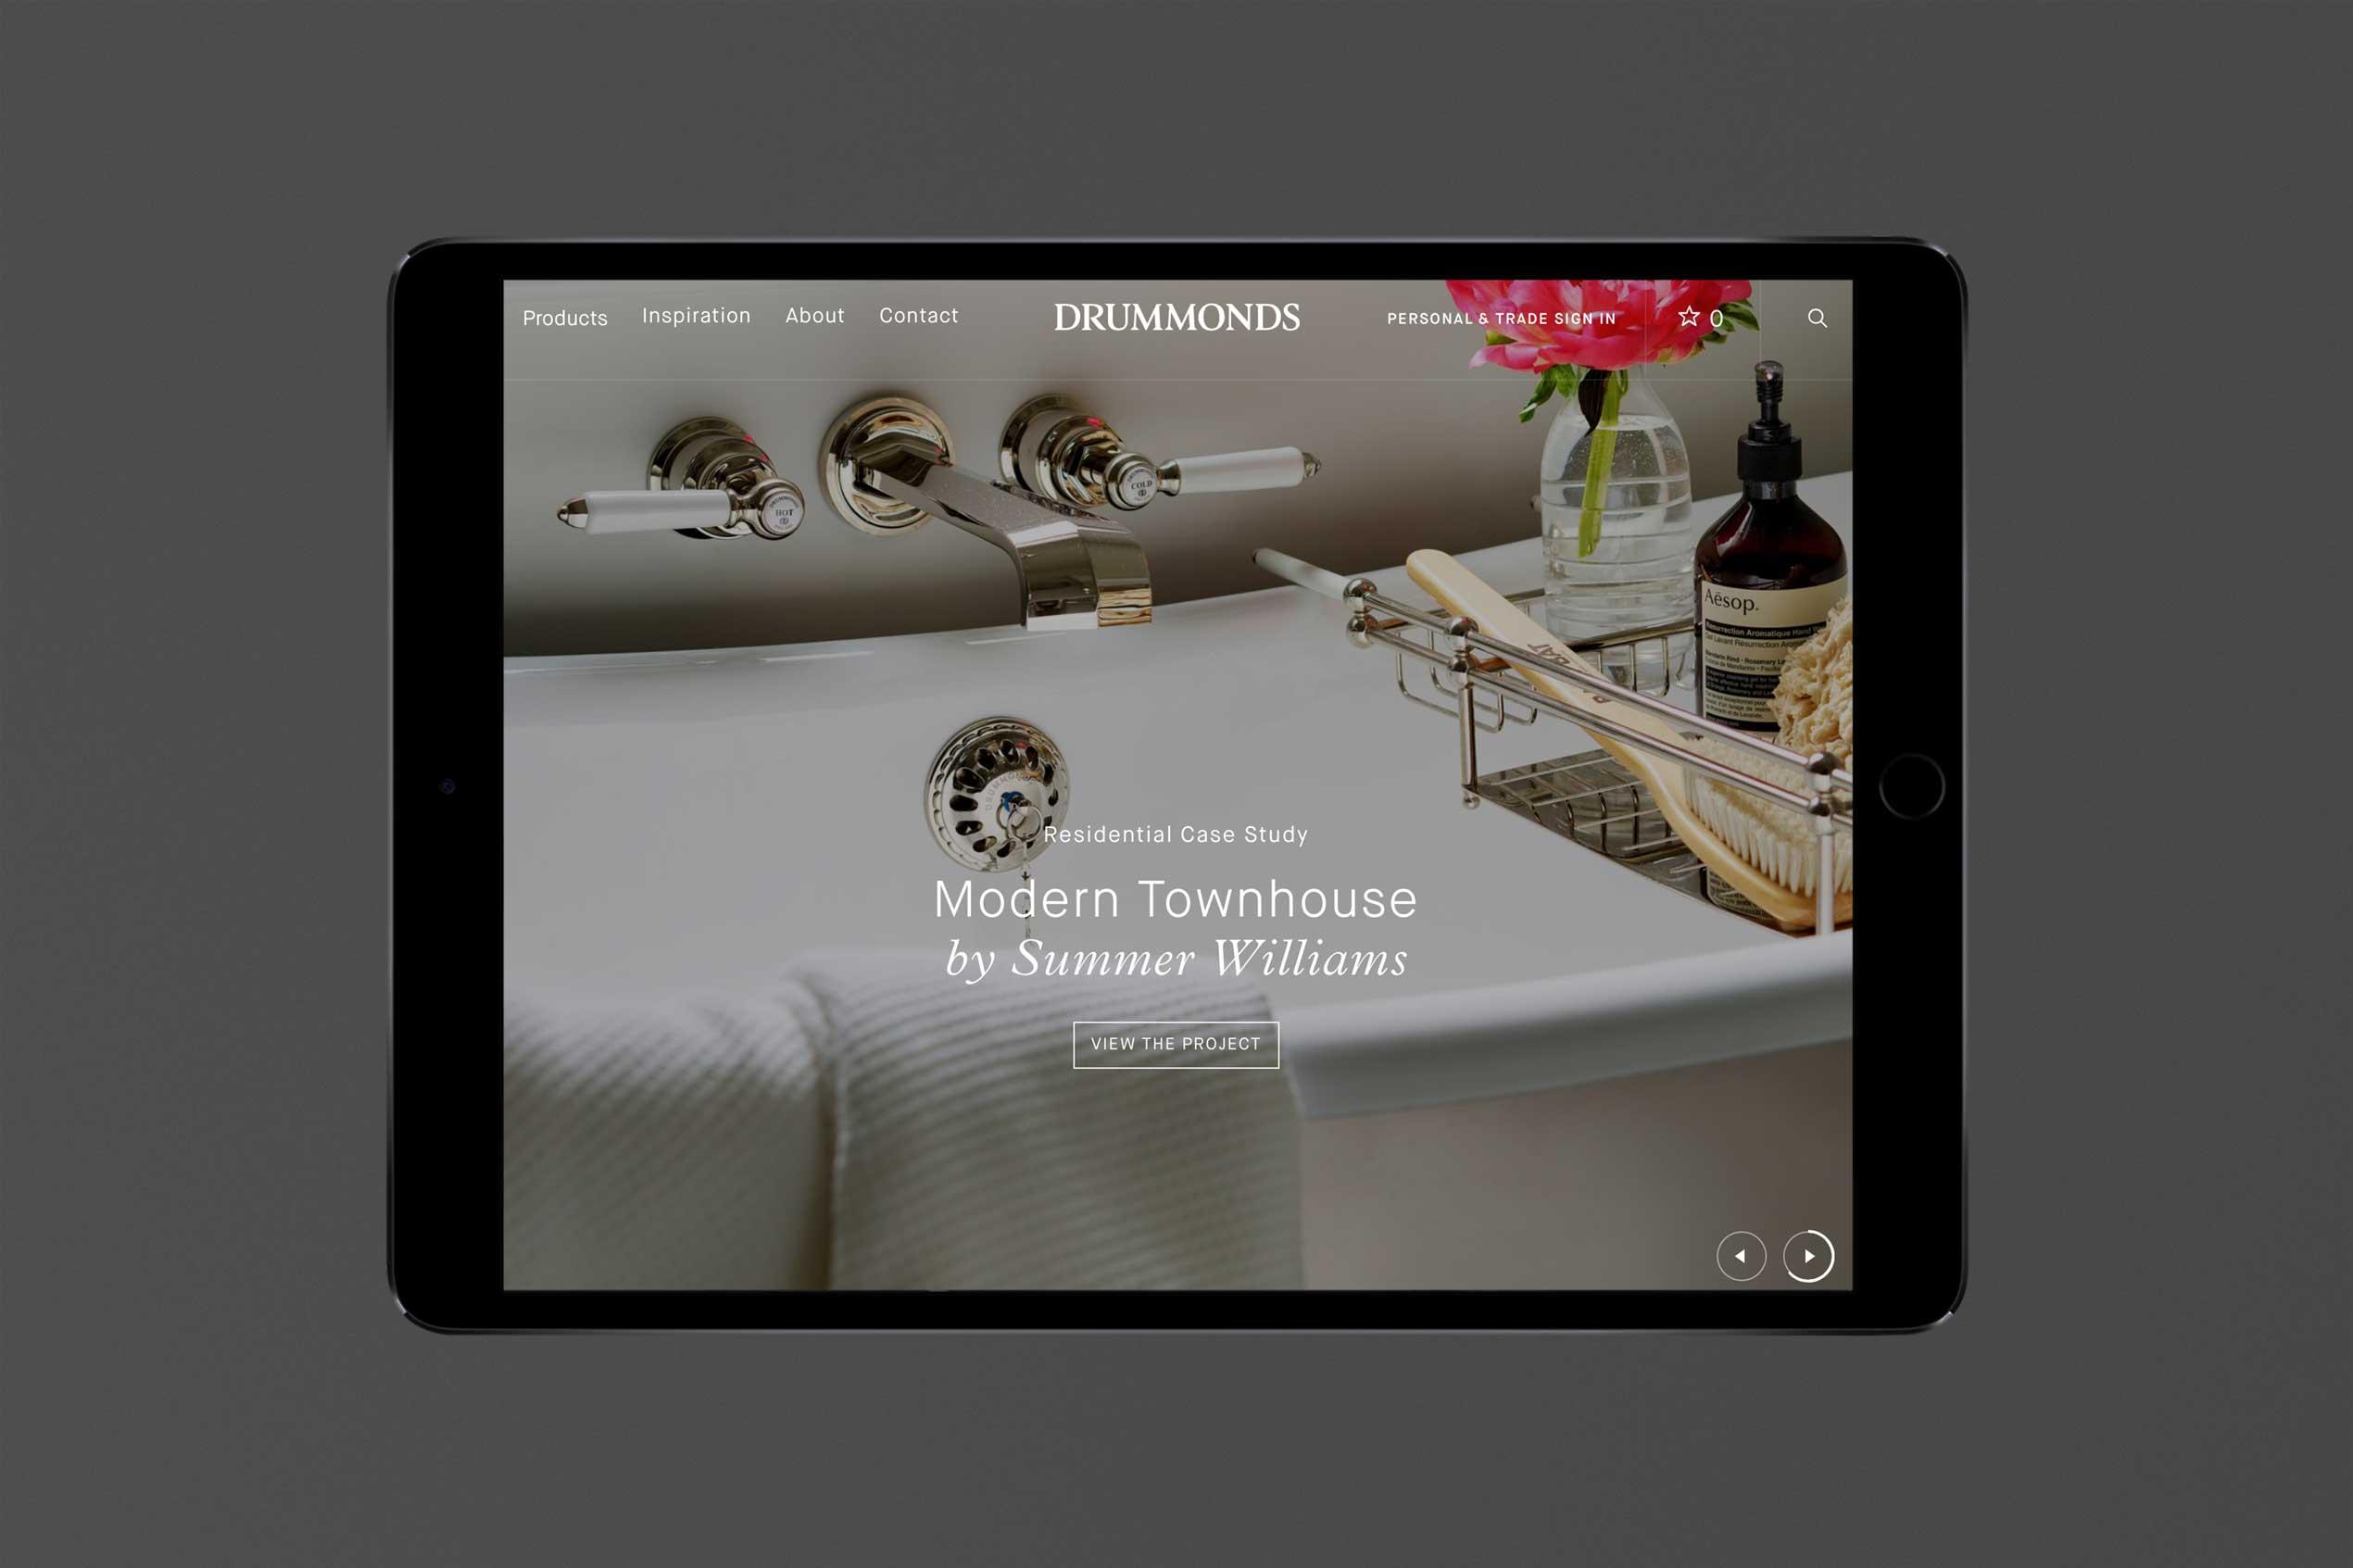 Drummonds logo on website